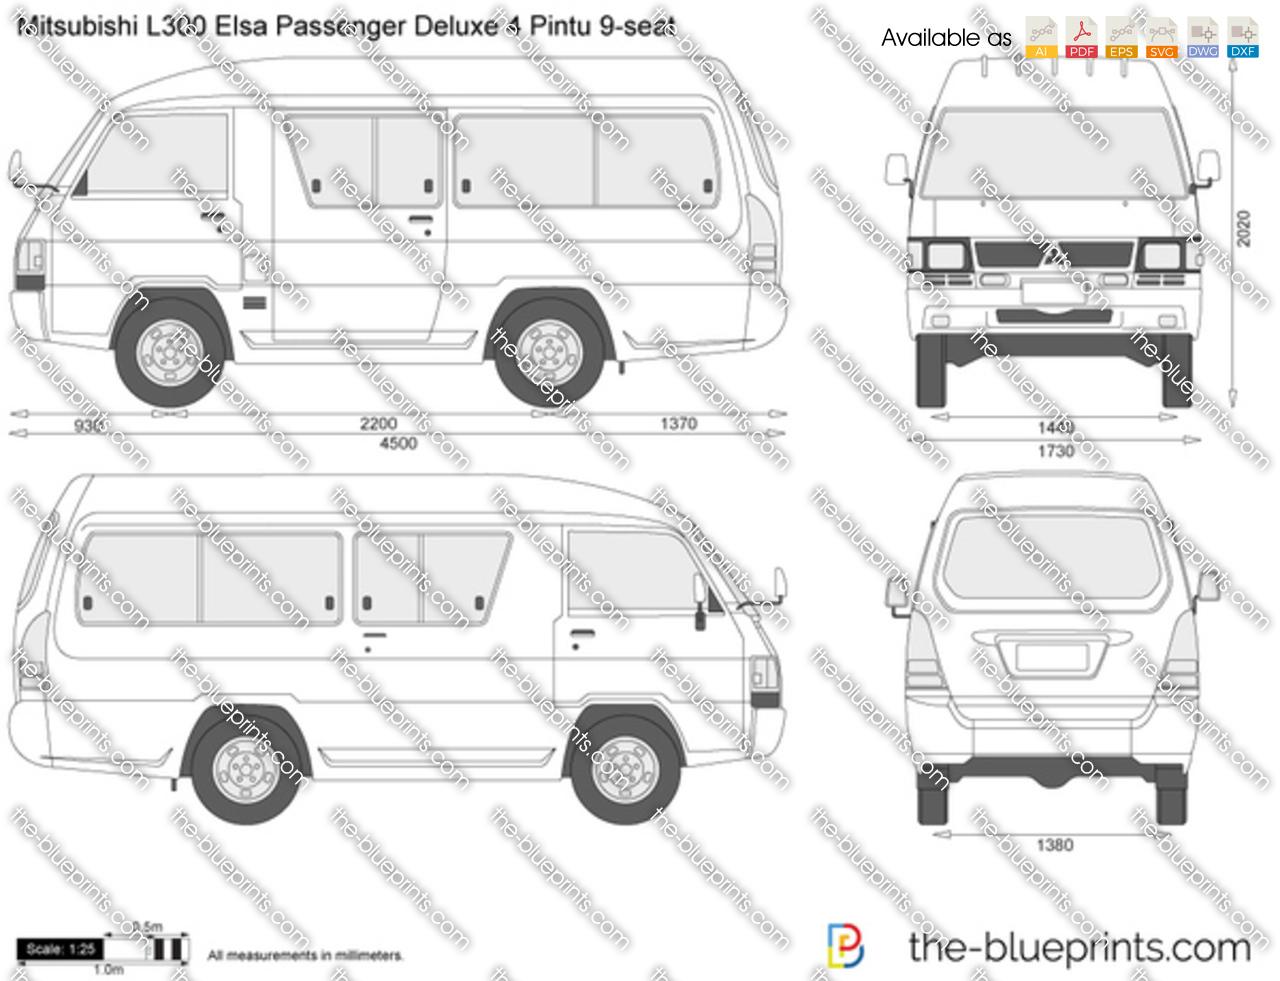 Mitsubishi L300 Elsa Passenger Deluxe 4 Pintu 9-seat 2016